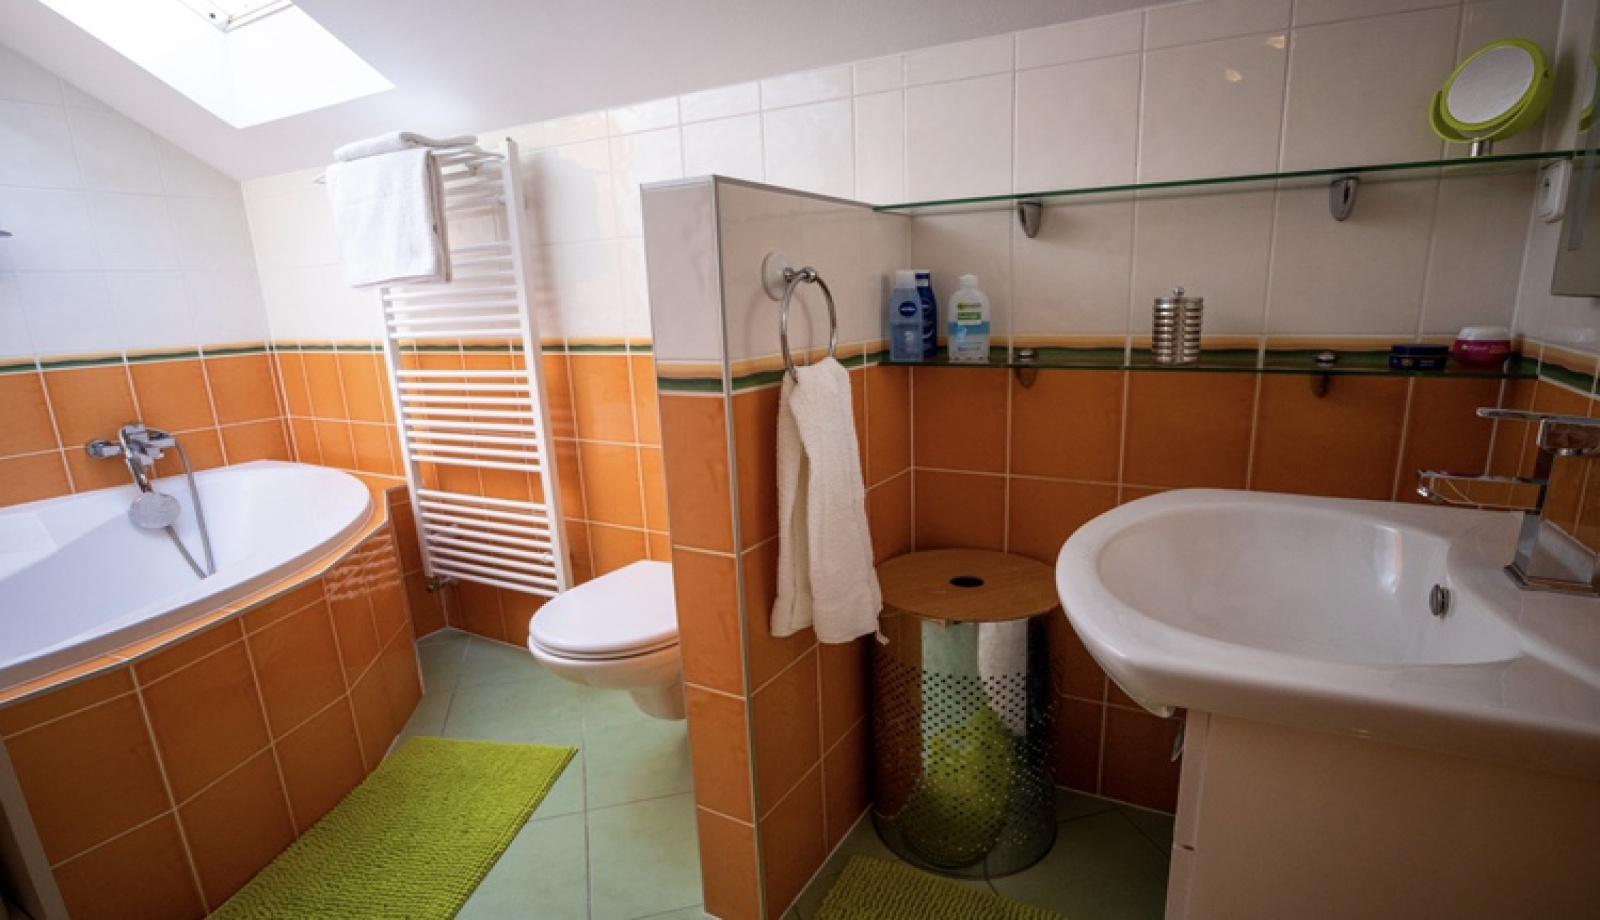 Syrovice, 4 Bedrooms Bedrooms, ,1 BathroomBathrooms,Rodinný dům,Na prodej,1044